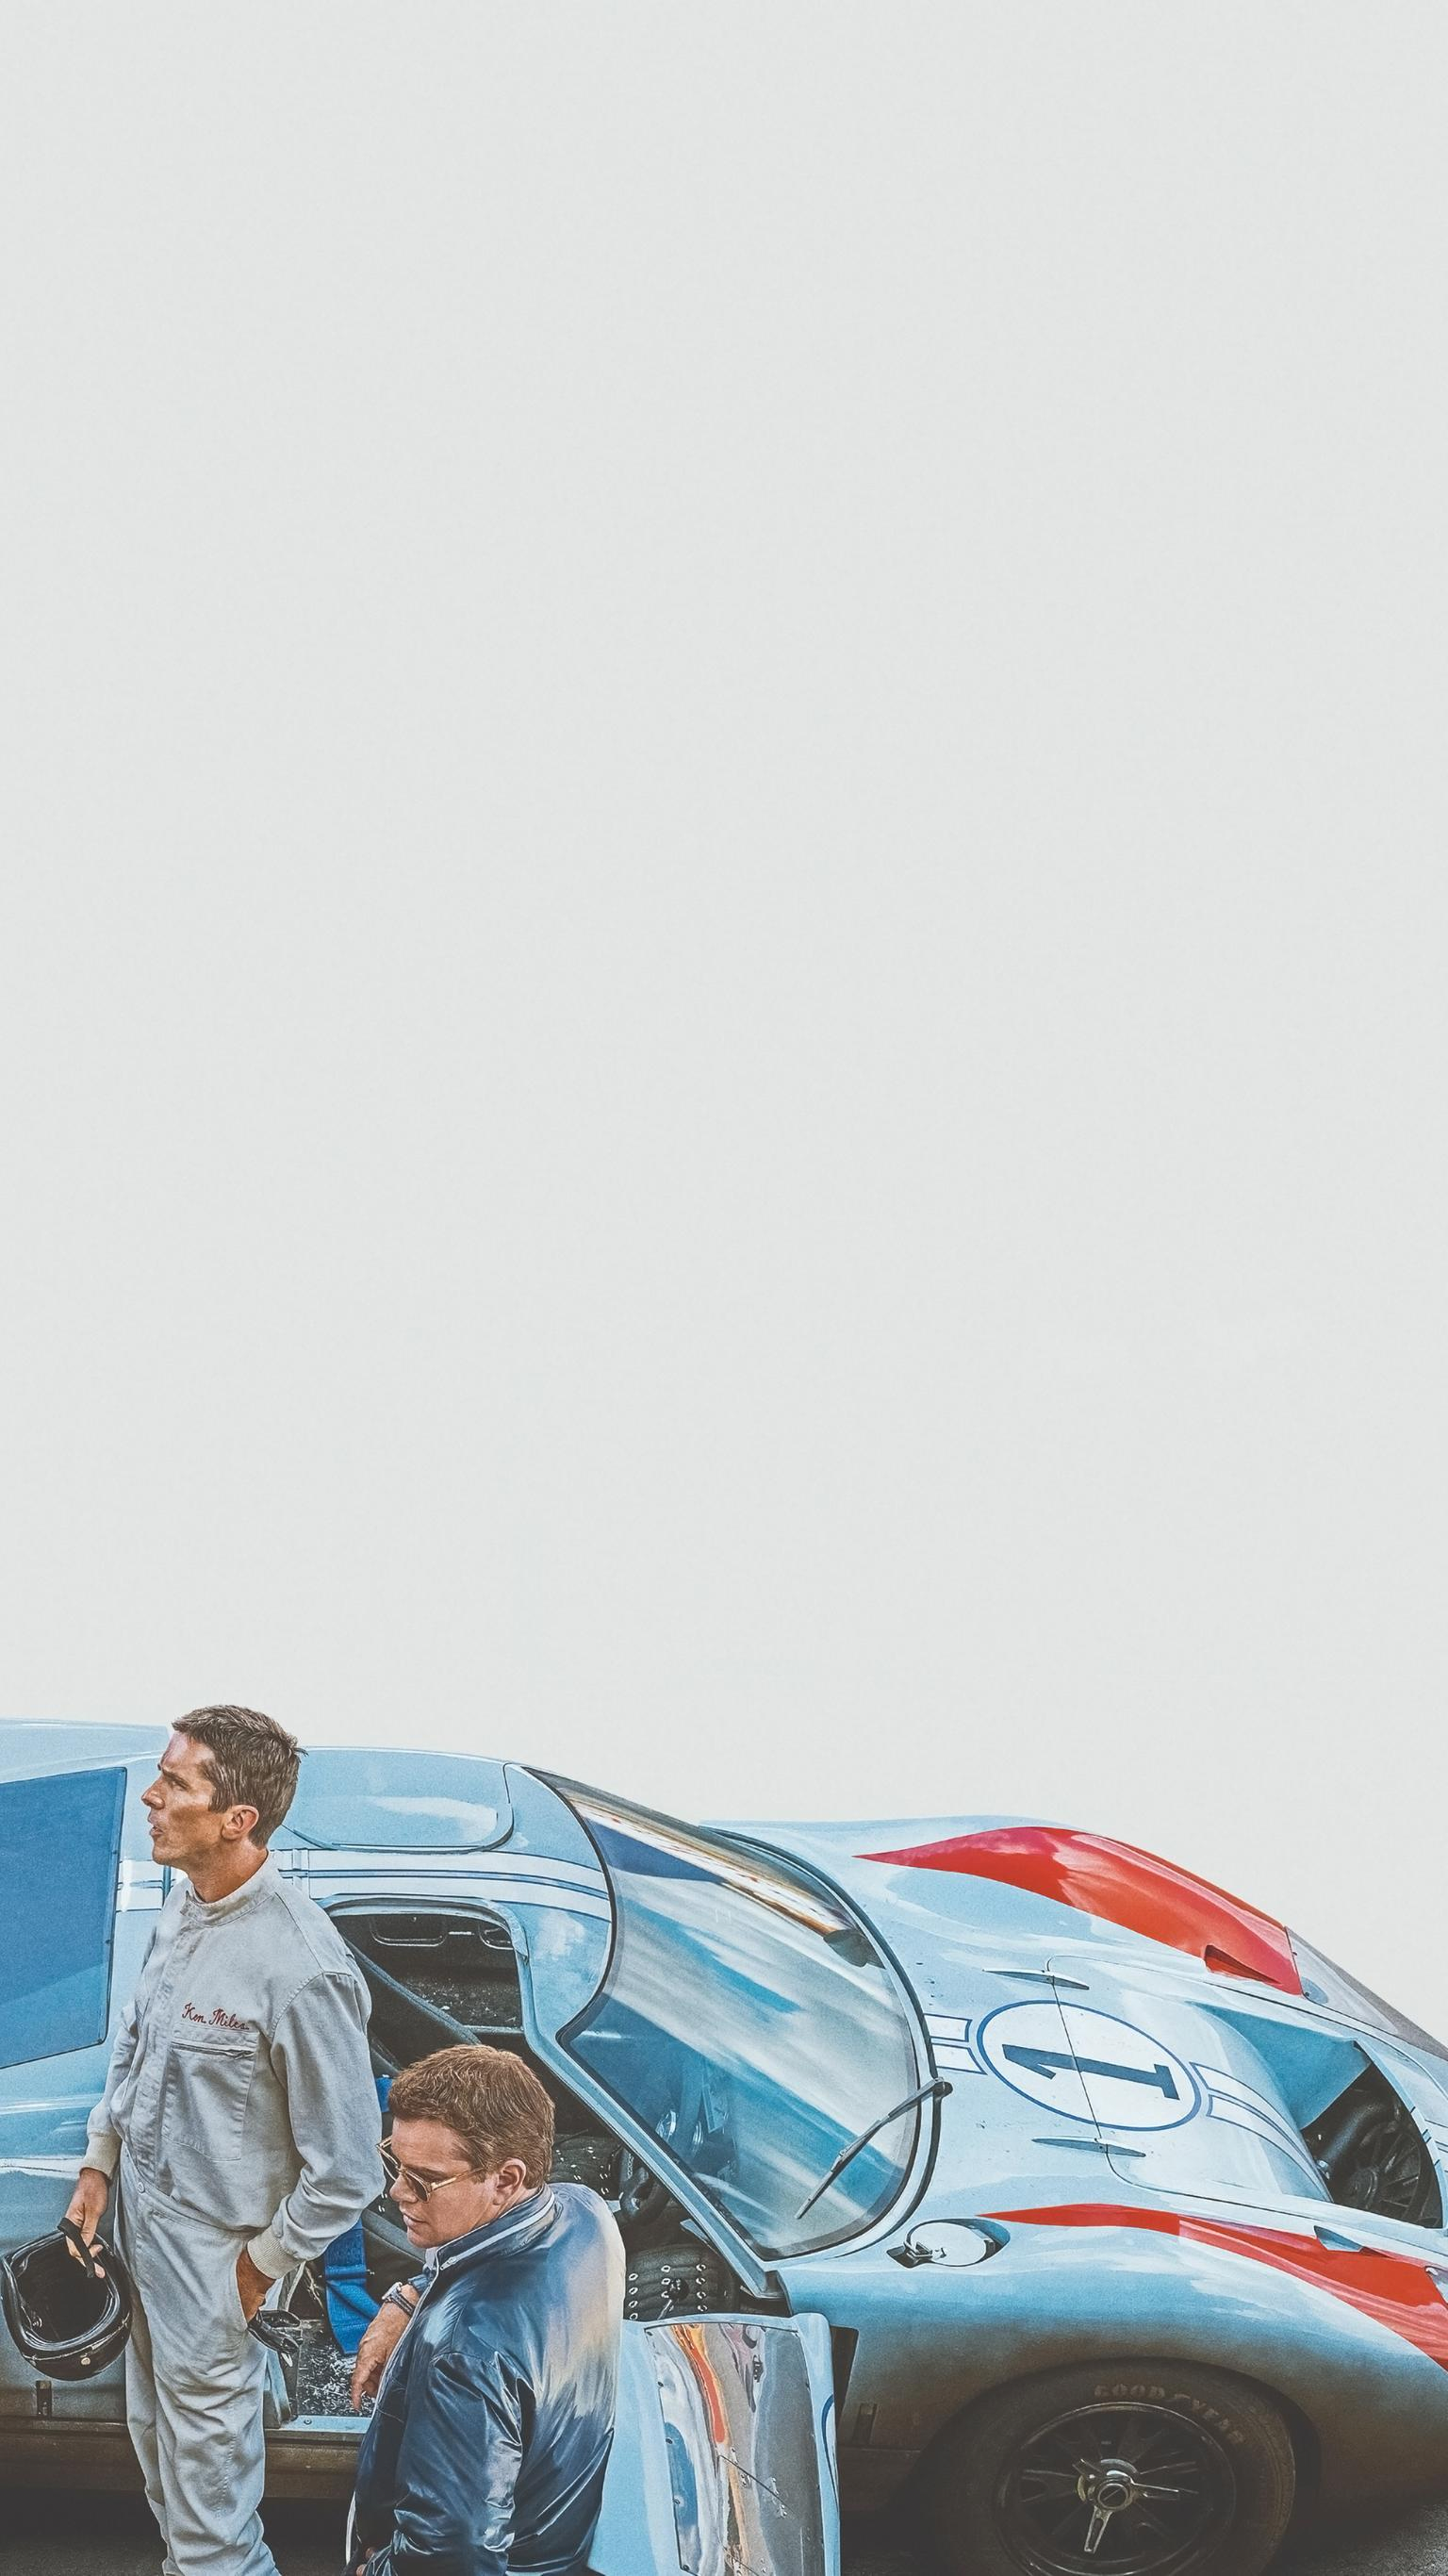 Ford Vs Ferrari Iphone Wallpapers Wallpaper Cave